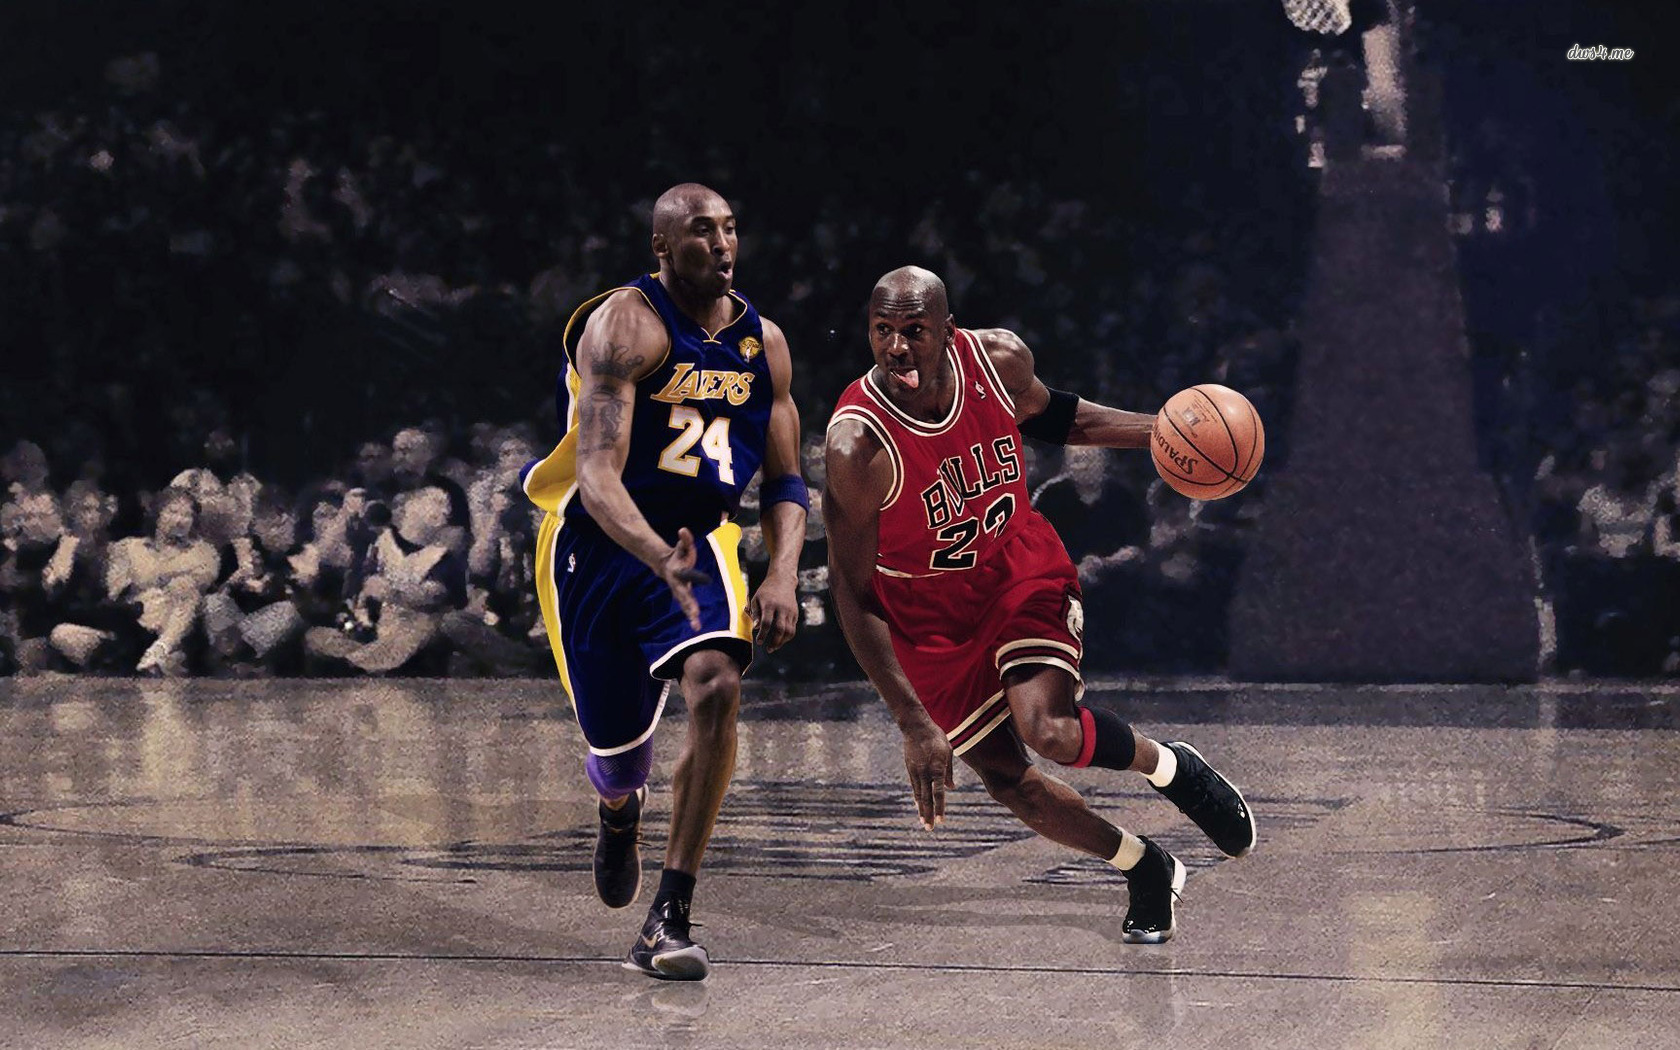 Jordan wallpaper 1280x800 Kobe Bryant Vs Michael Jordan wallpaper 1680x1050